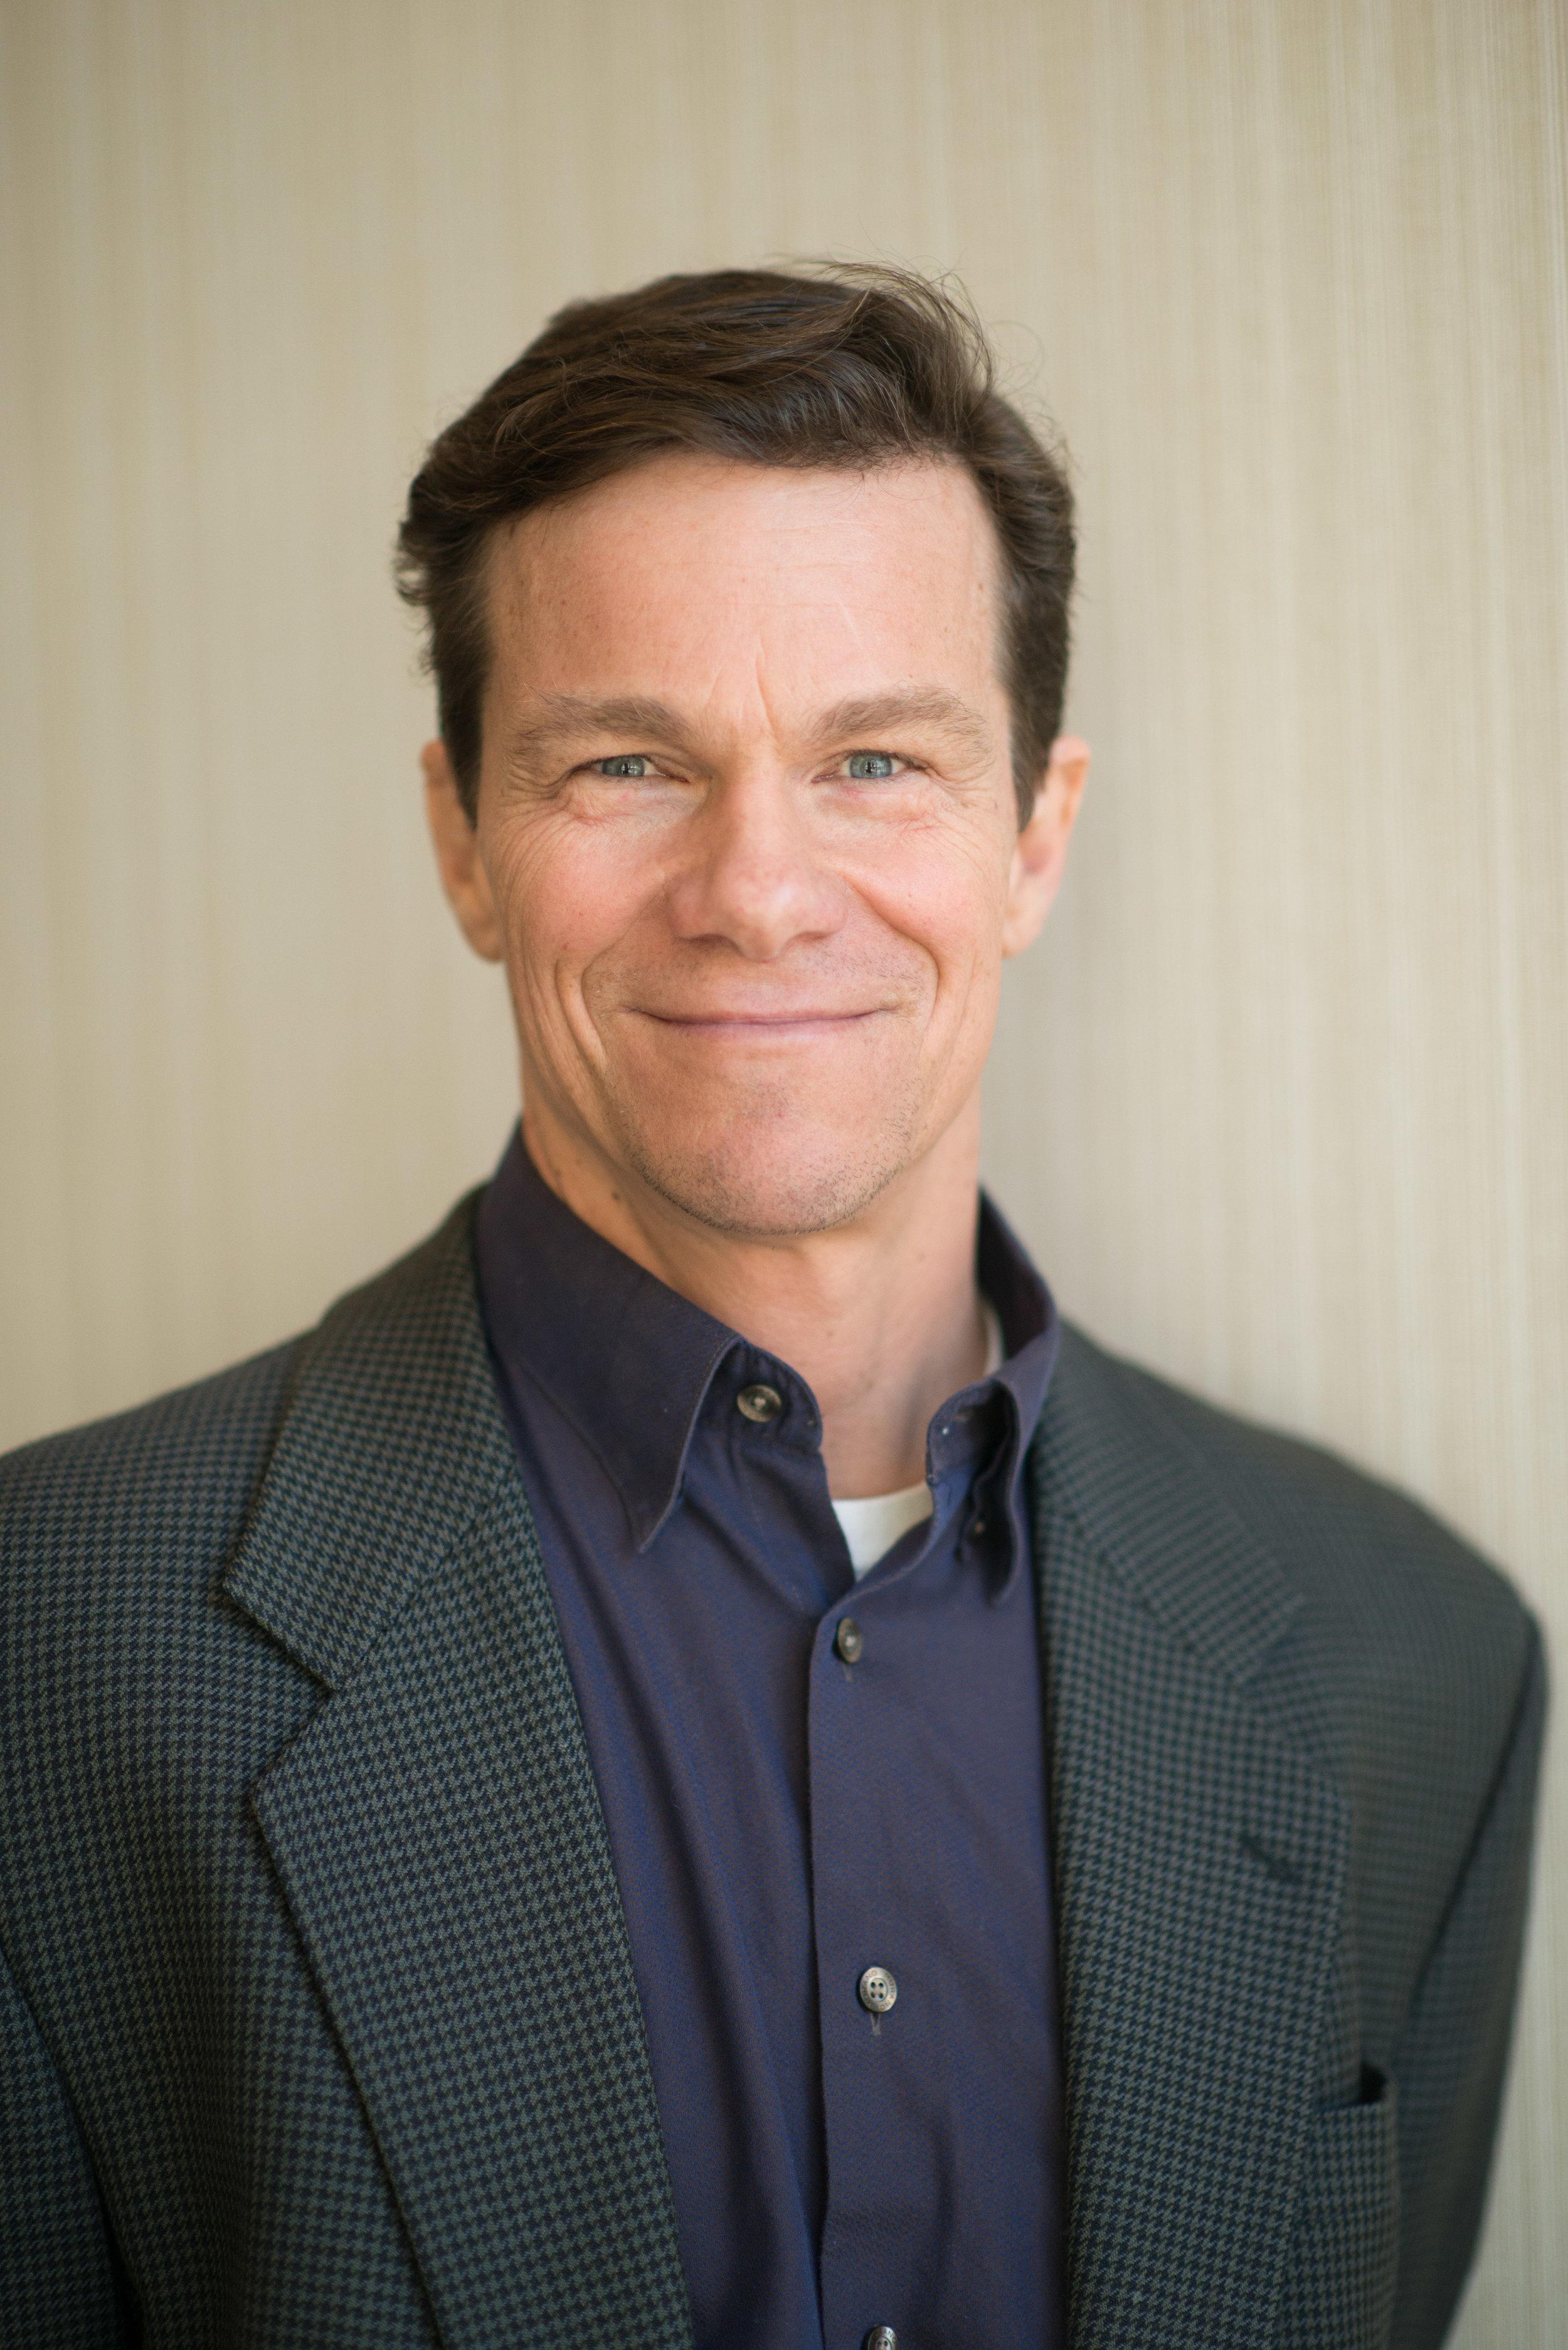 Kristof Irwin, PE, Principal